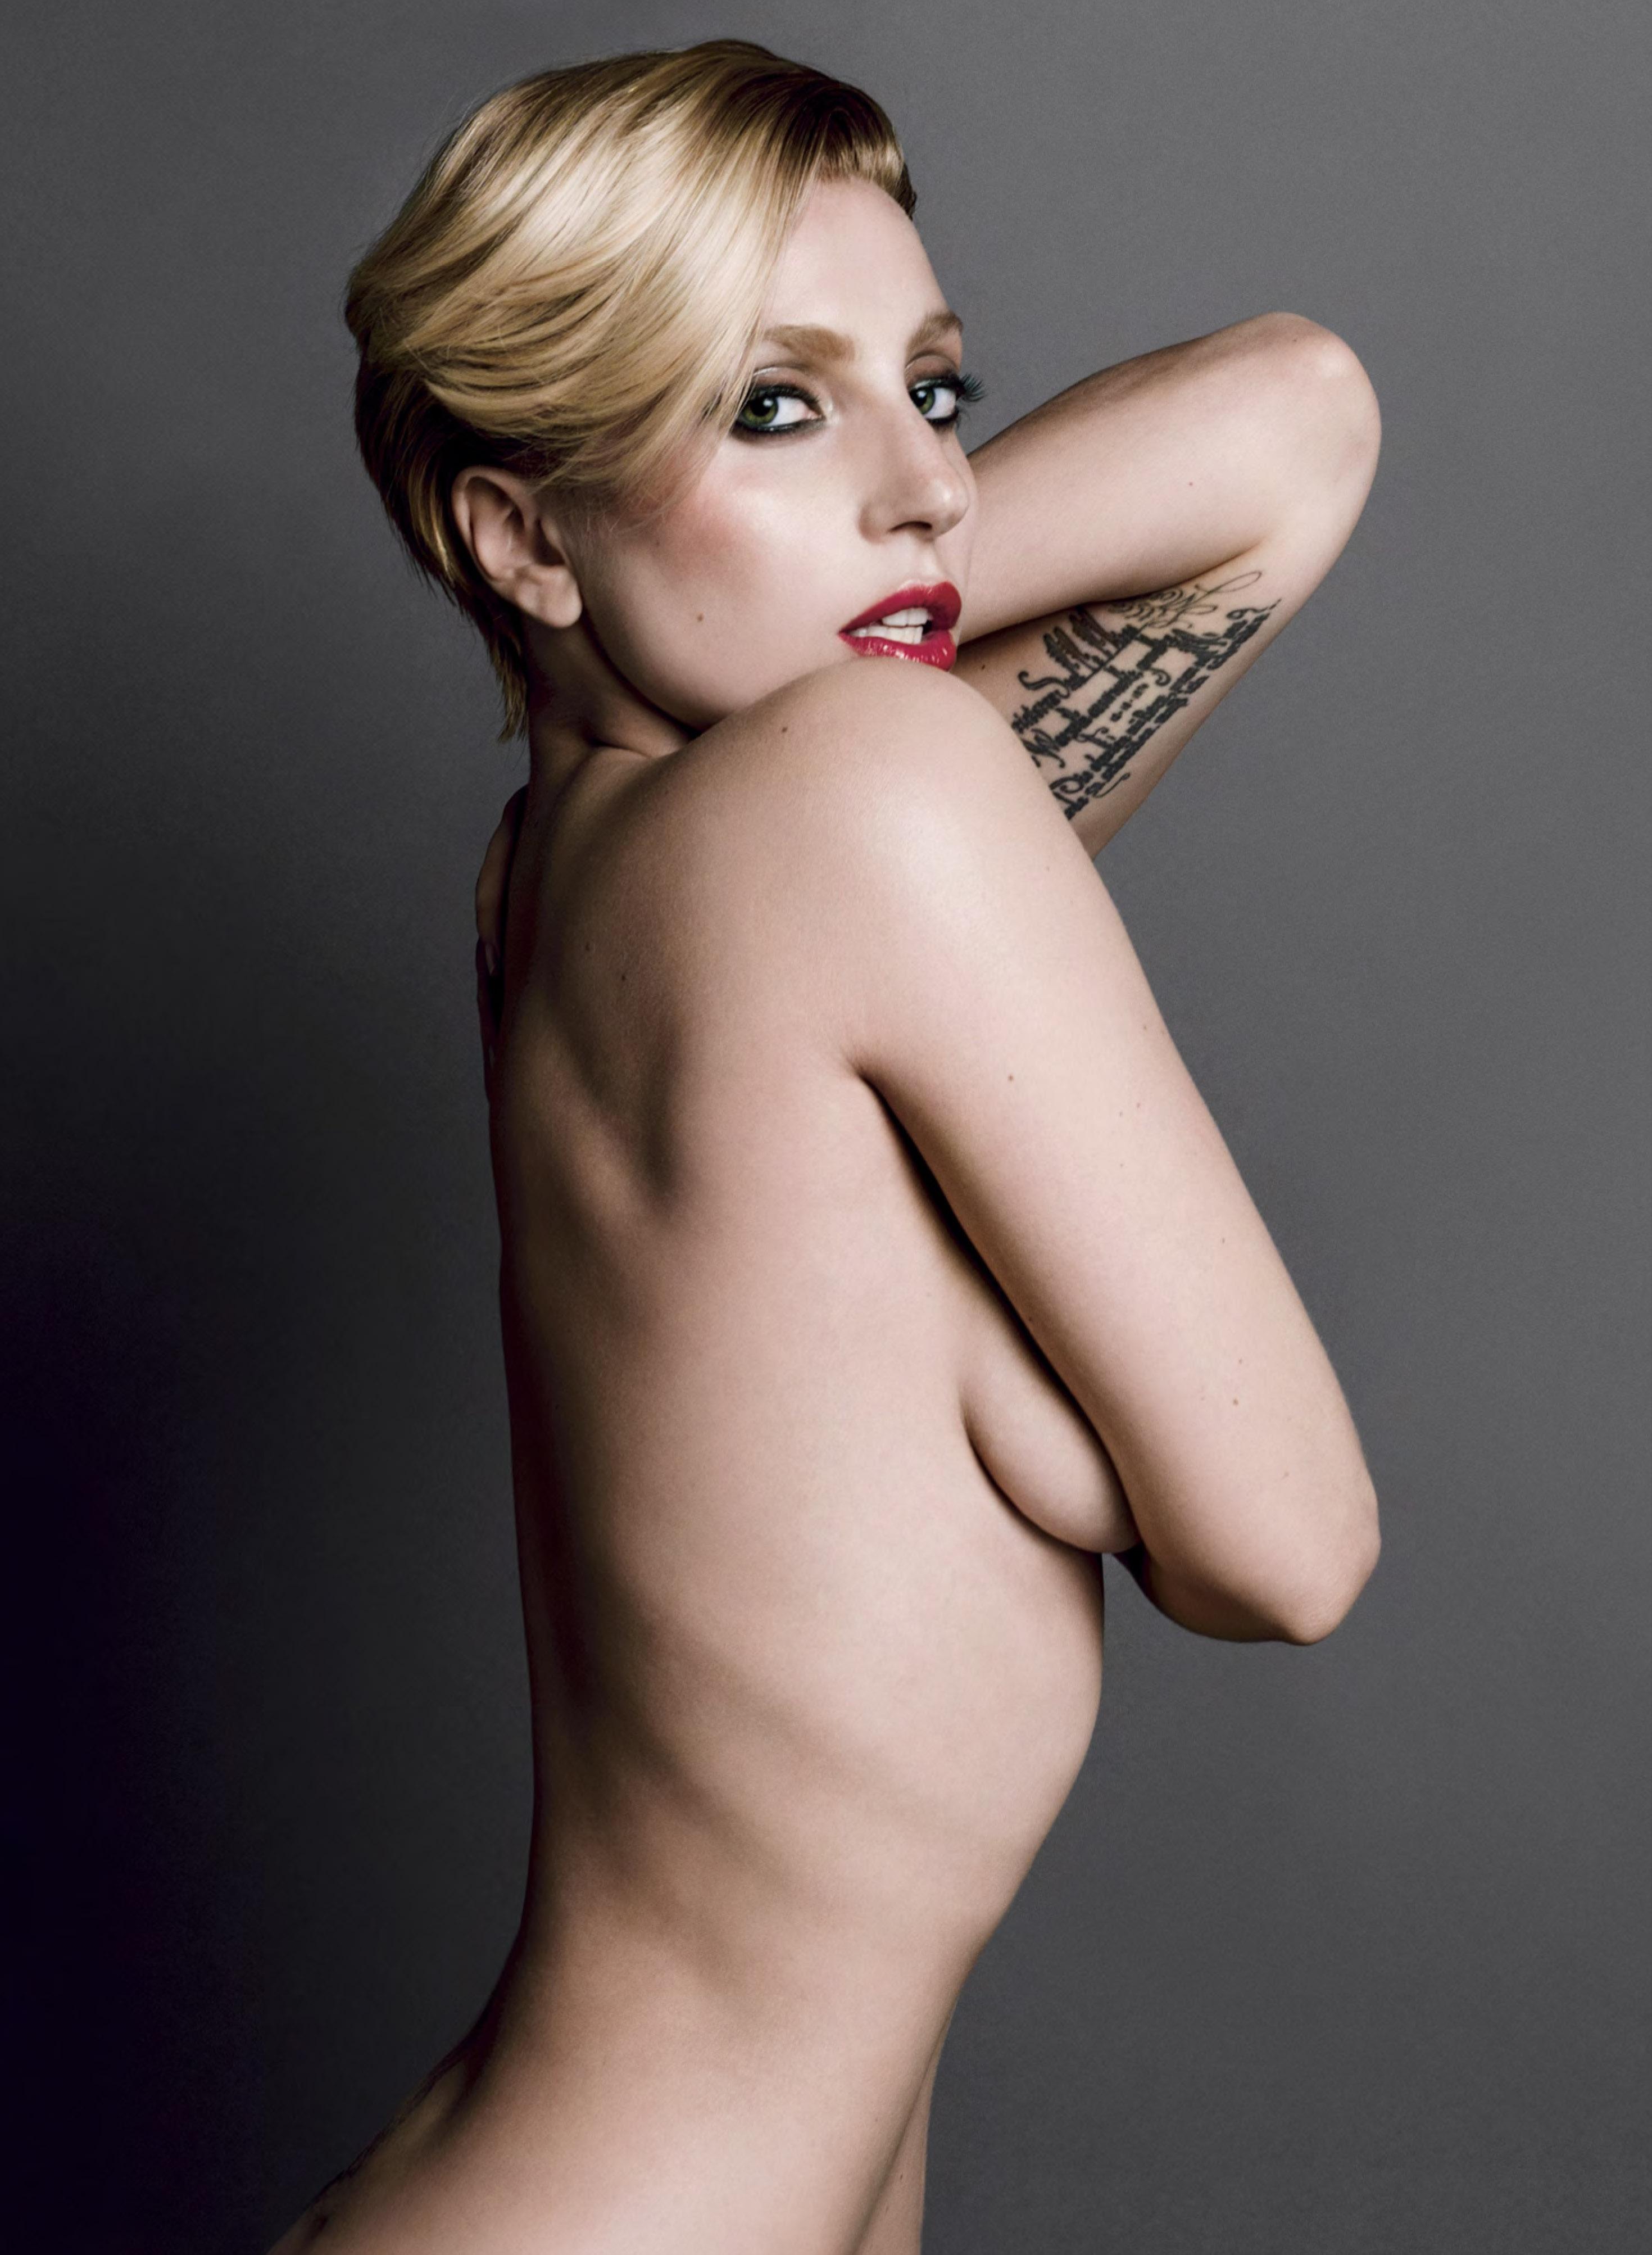 Lady gaga nude magazine